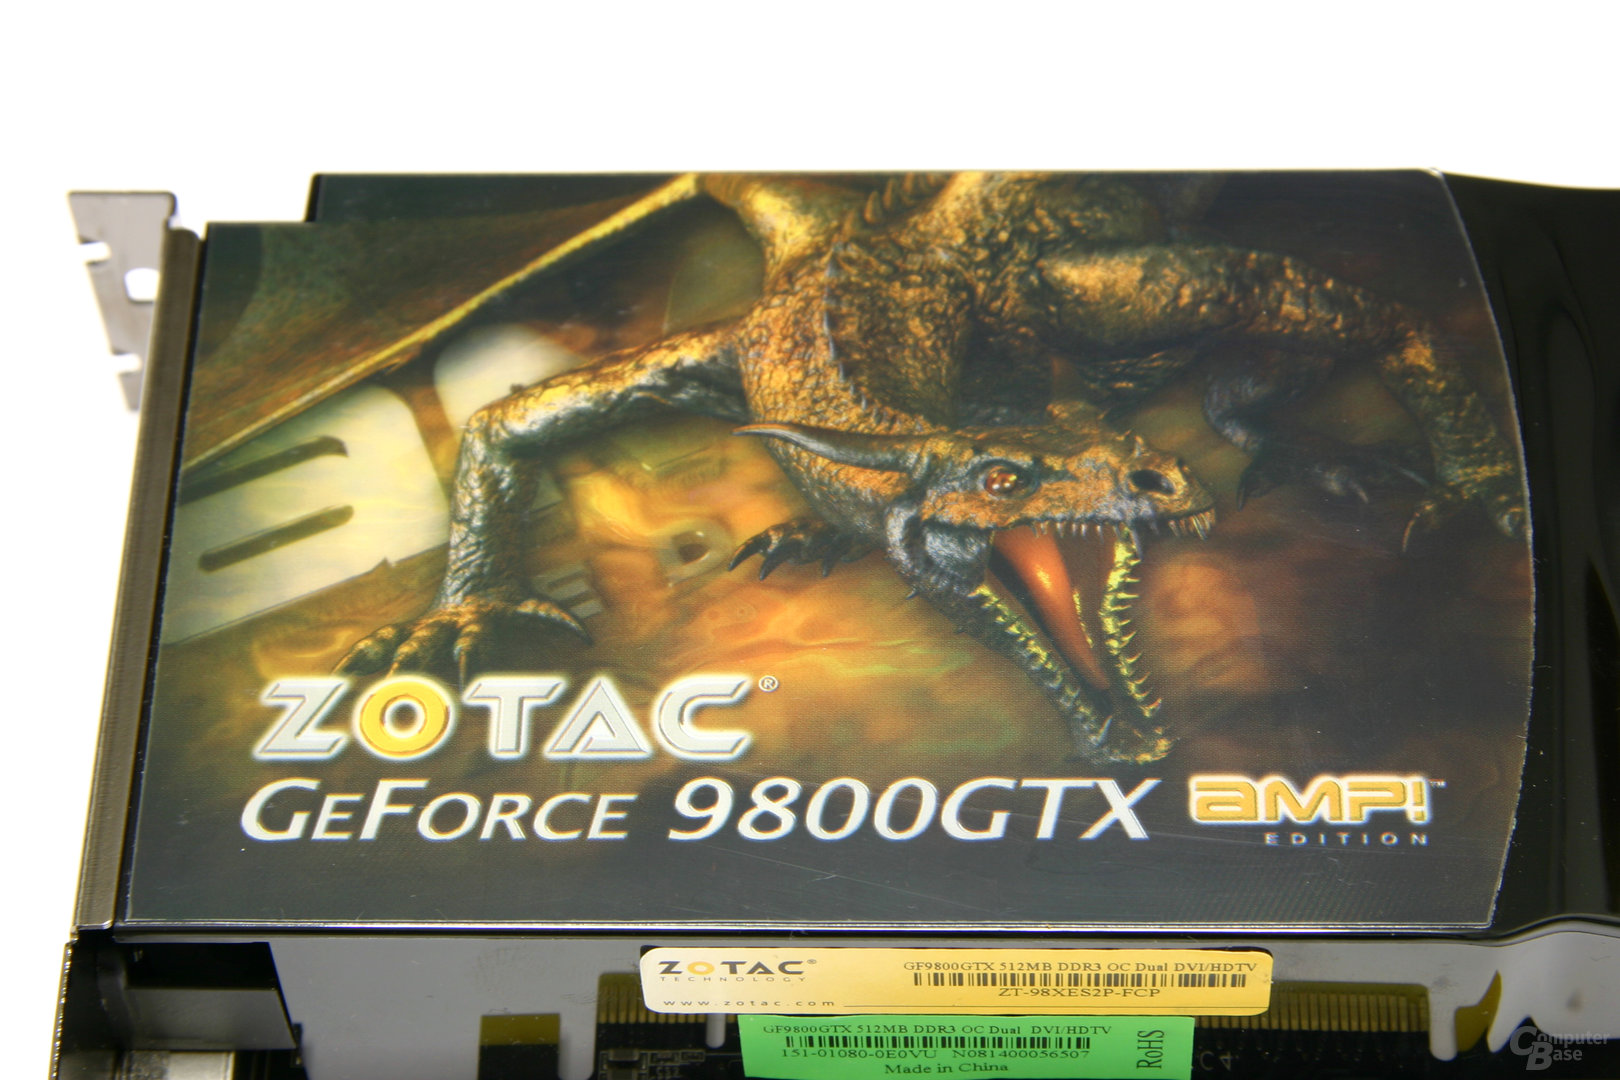 GeForce 9800 GTX AMP! Edition Logo